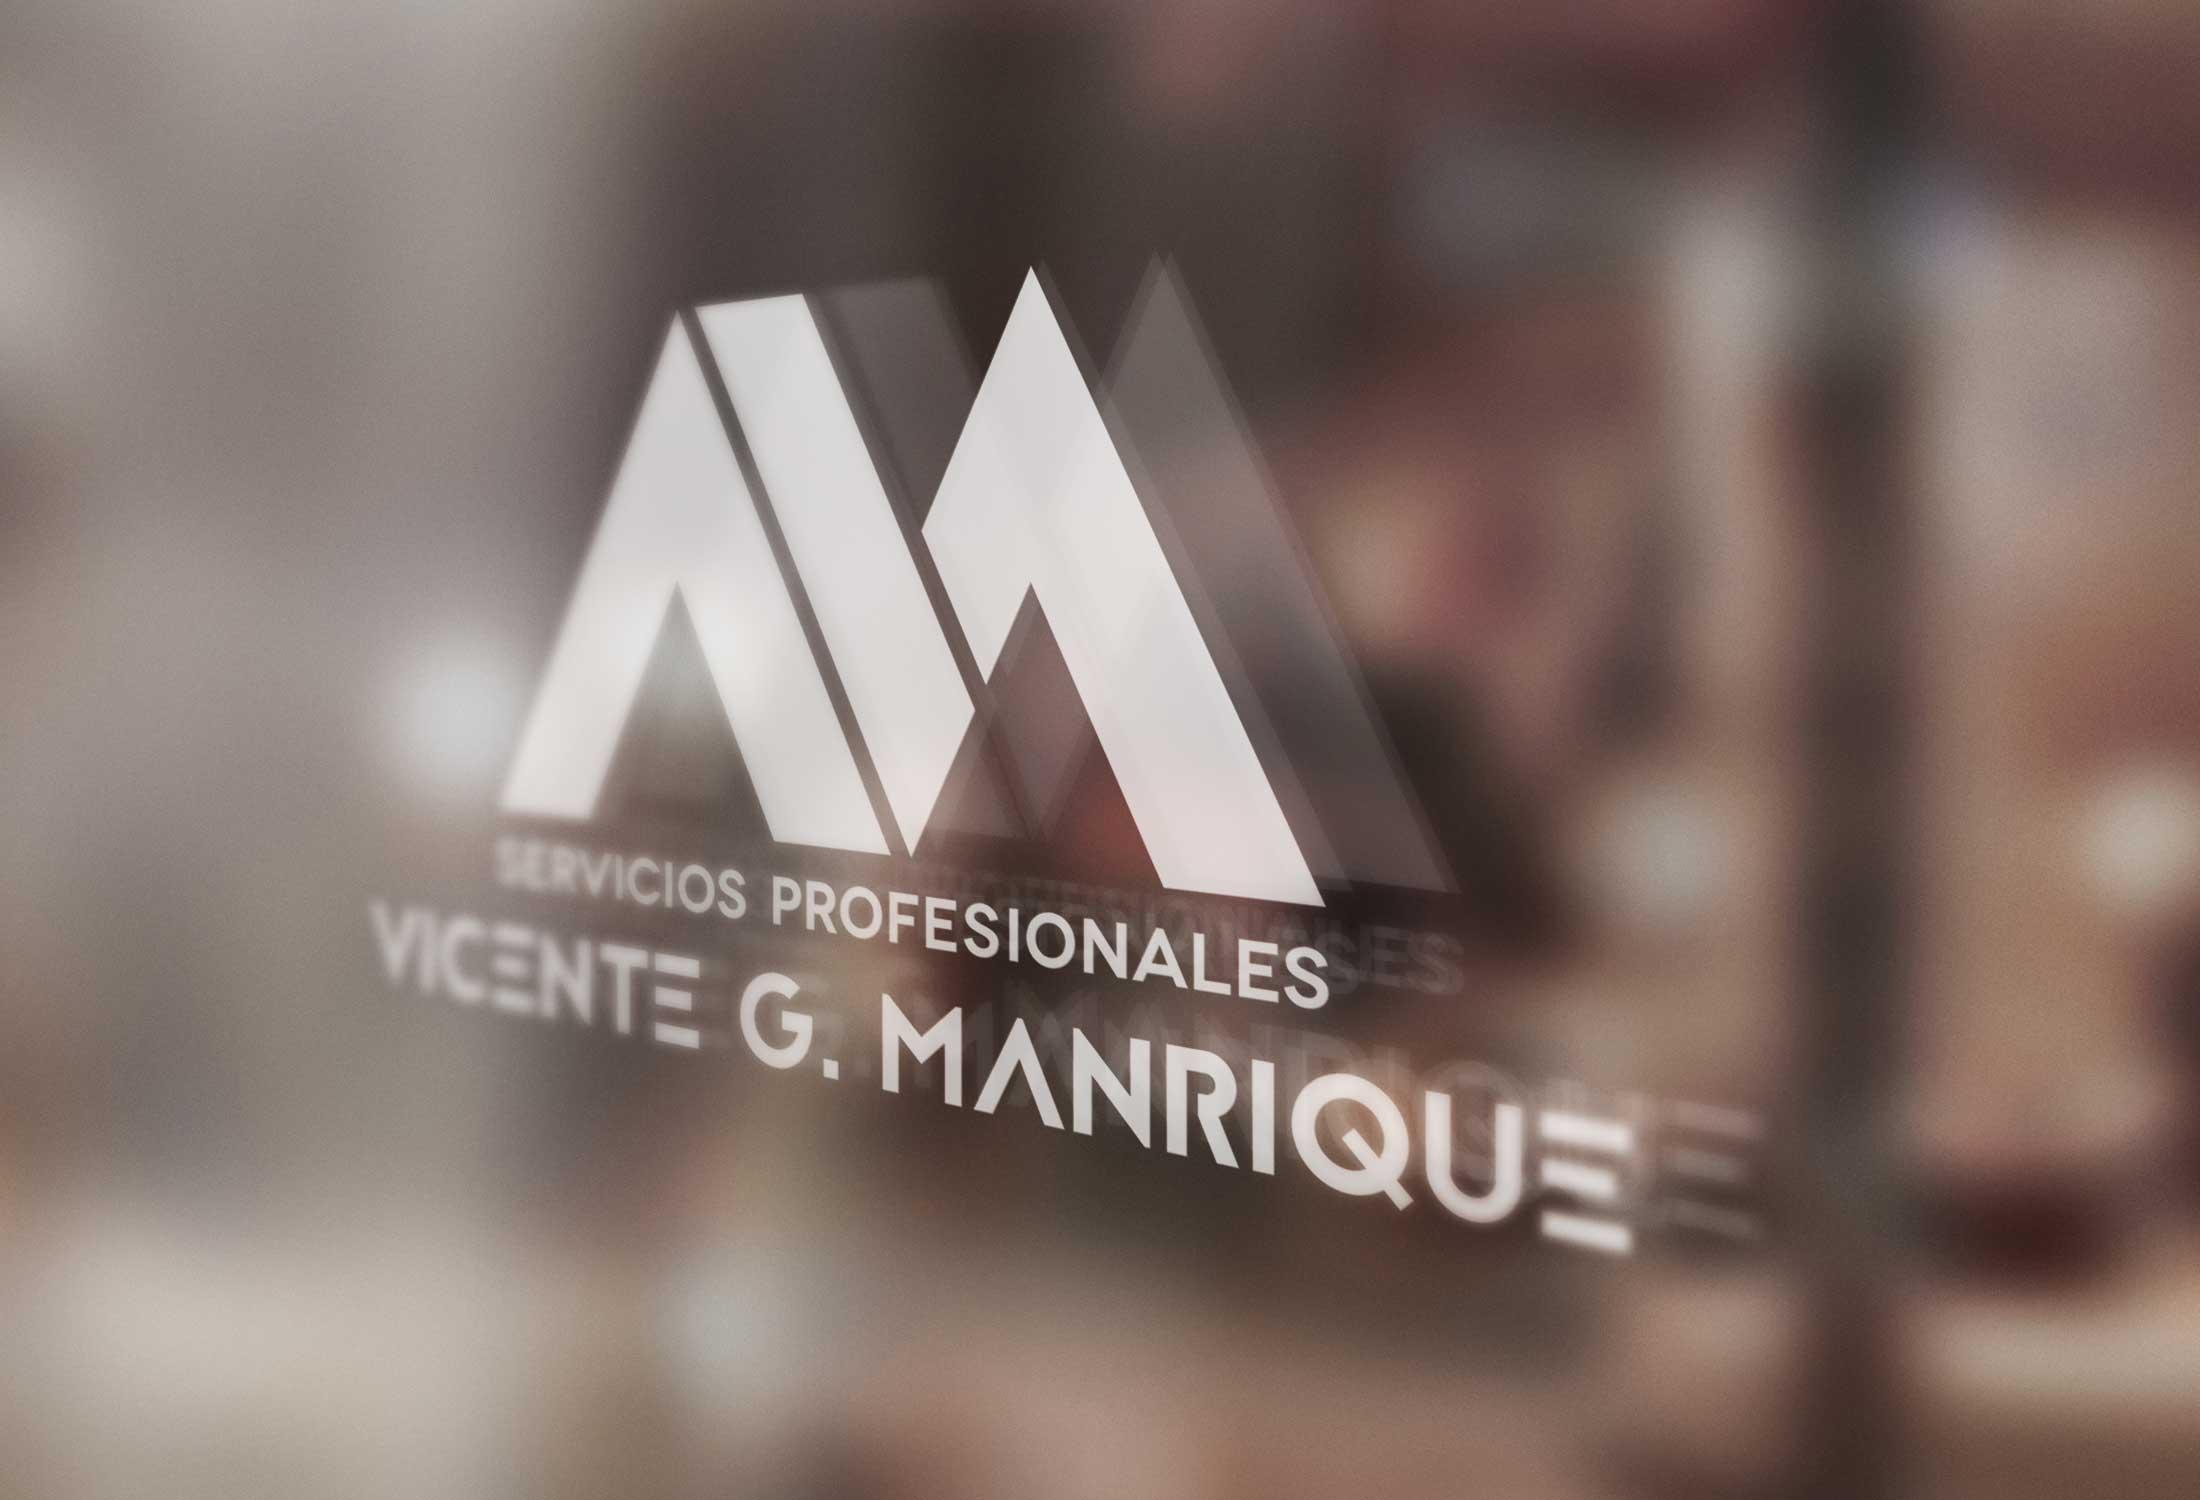 Vicente G. Manrique Branding personal, vinilo para vidrio